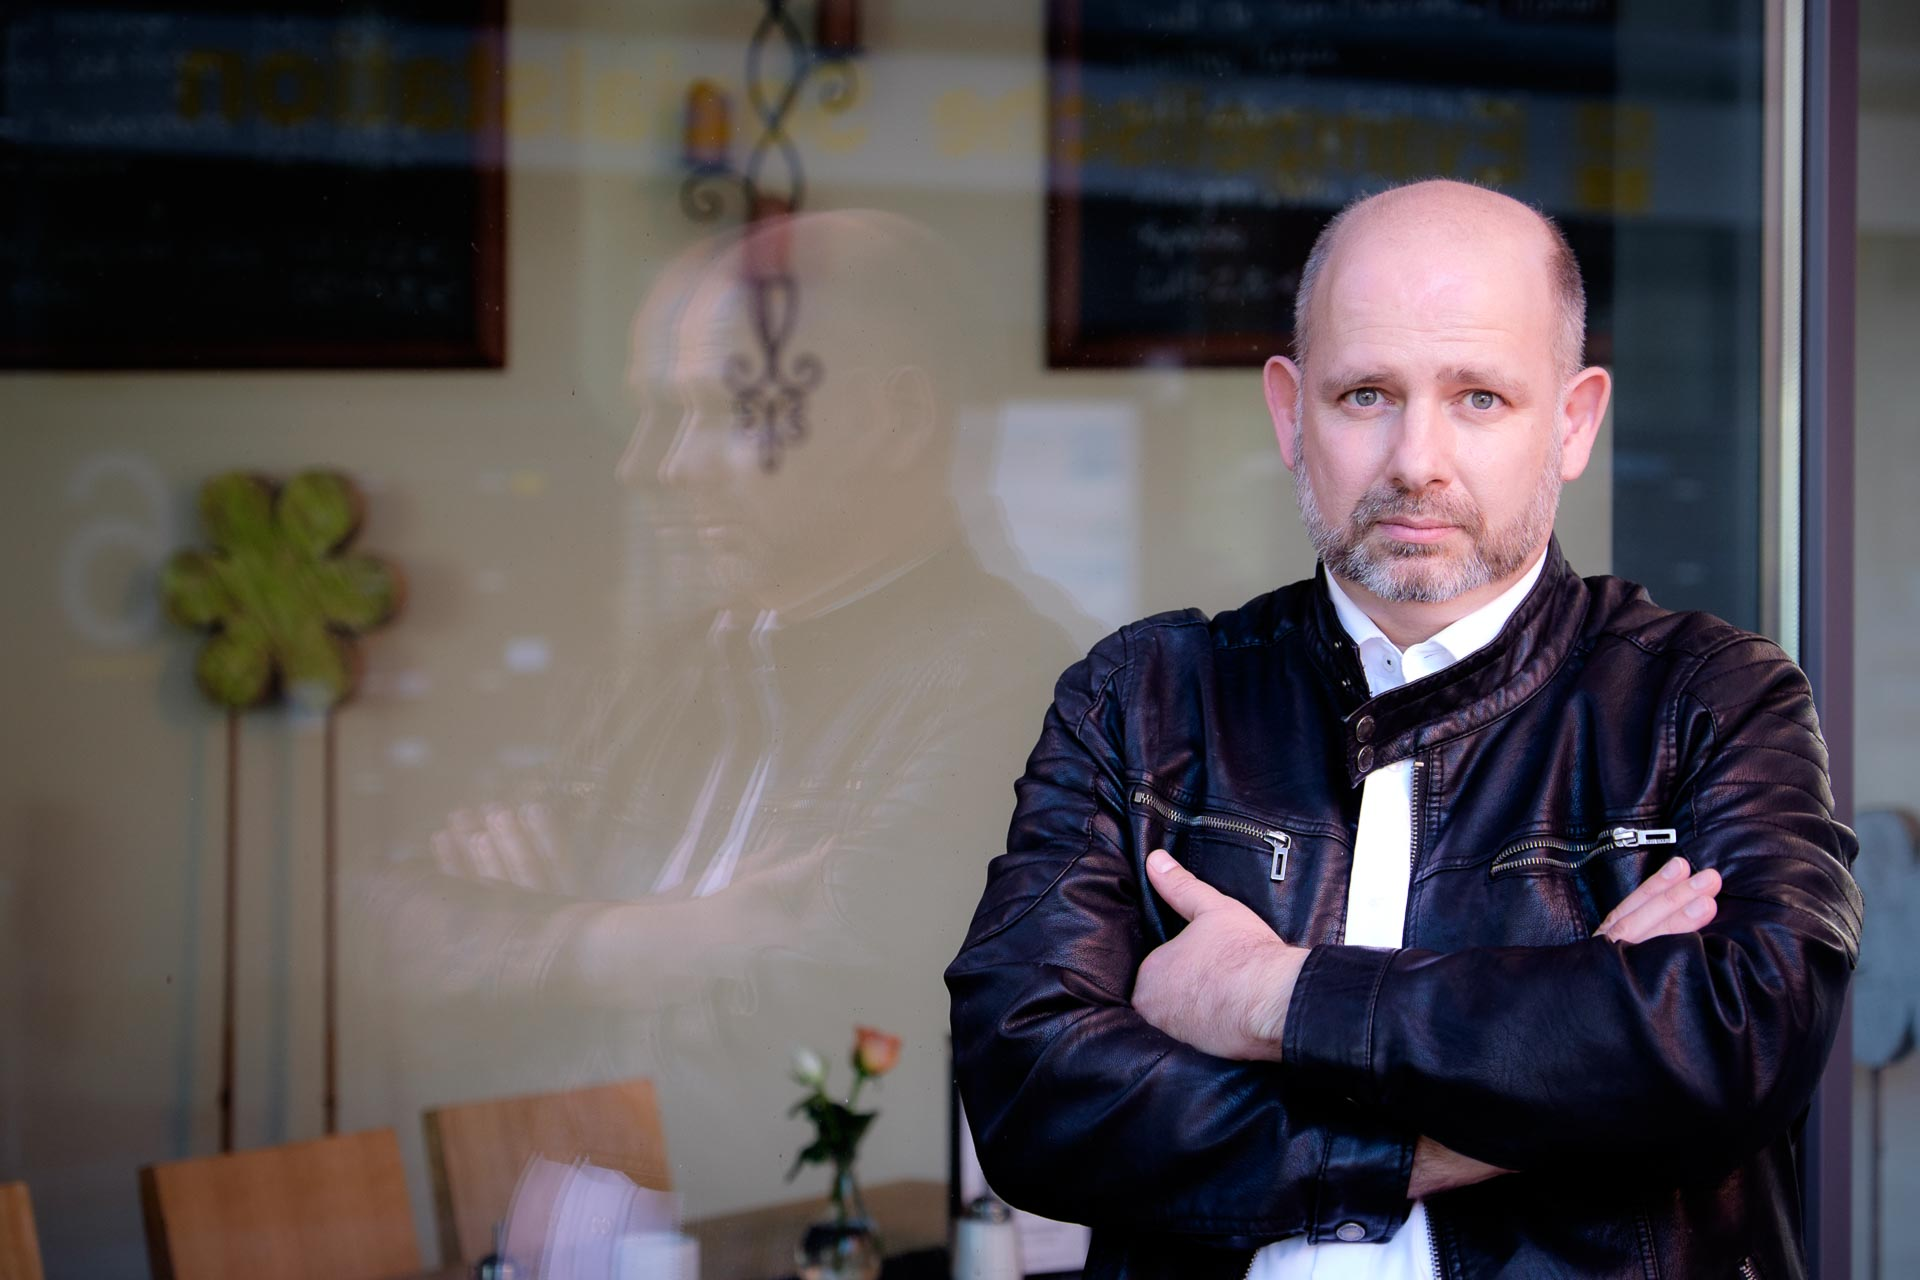 Fotograf Bad Rappenau Spieltenor Holger Ries